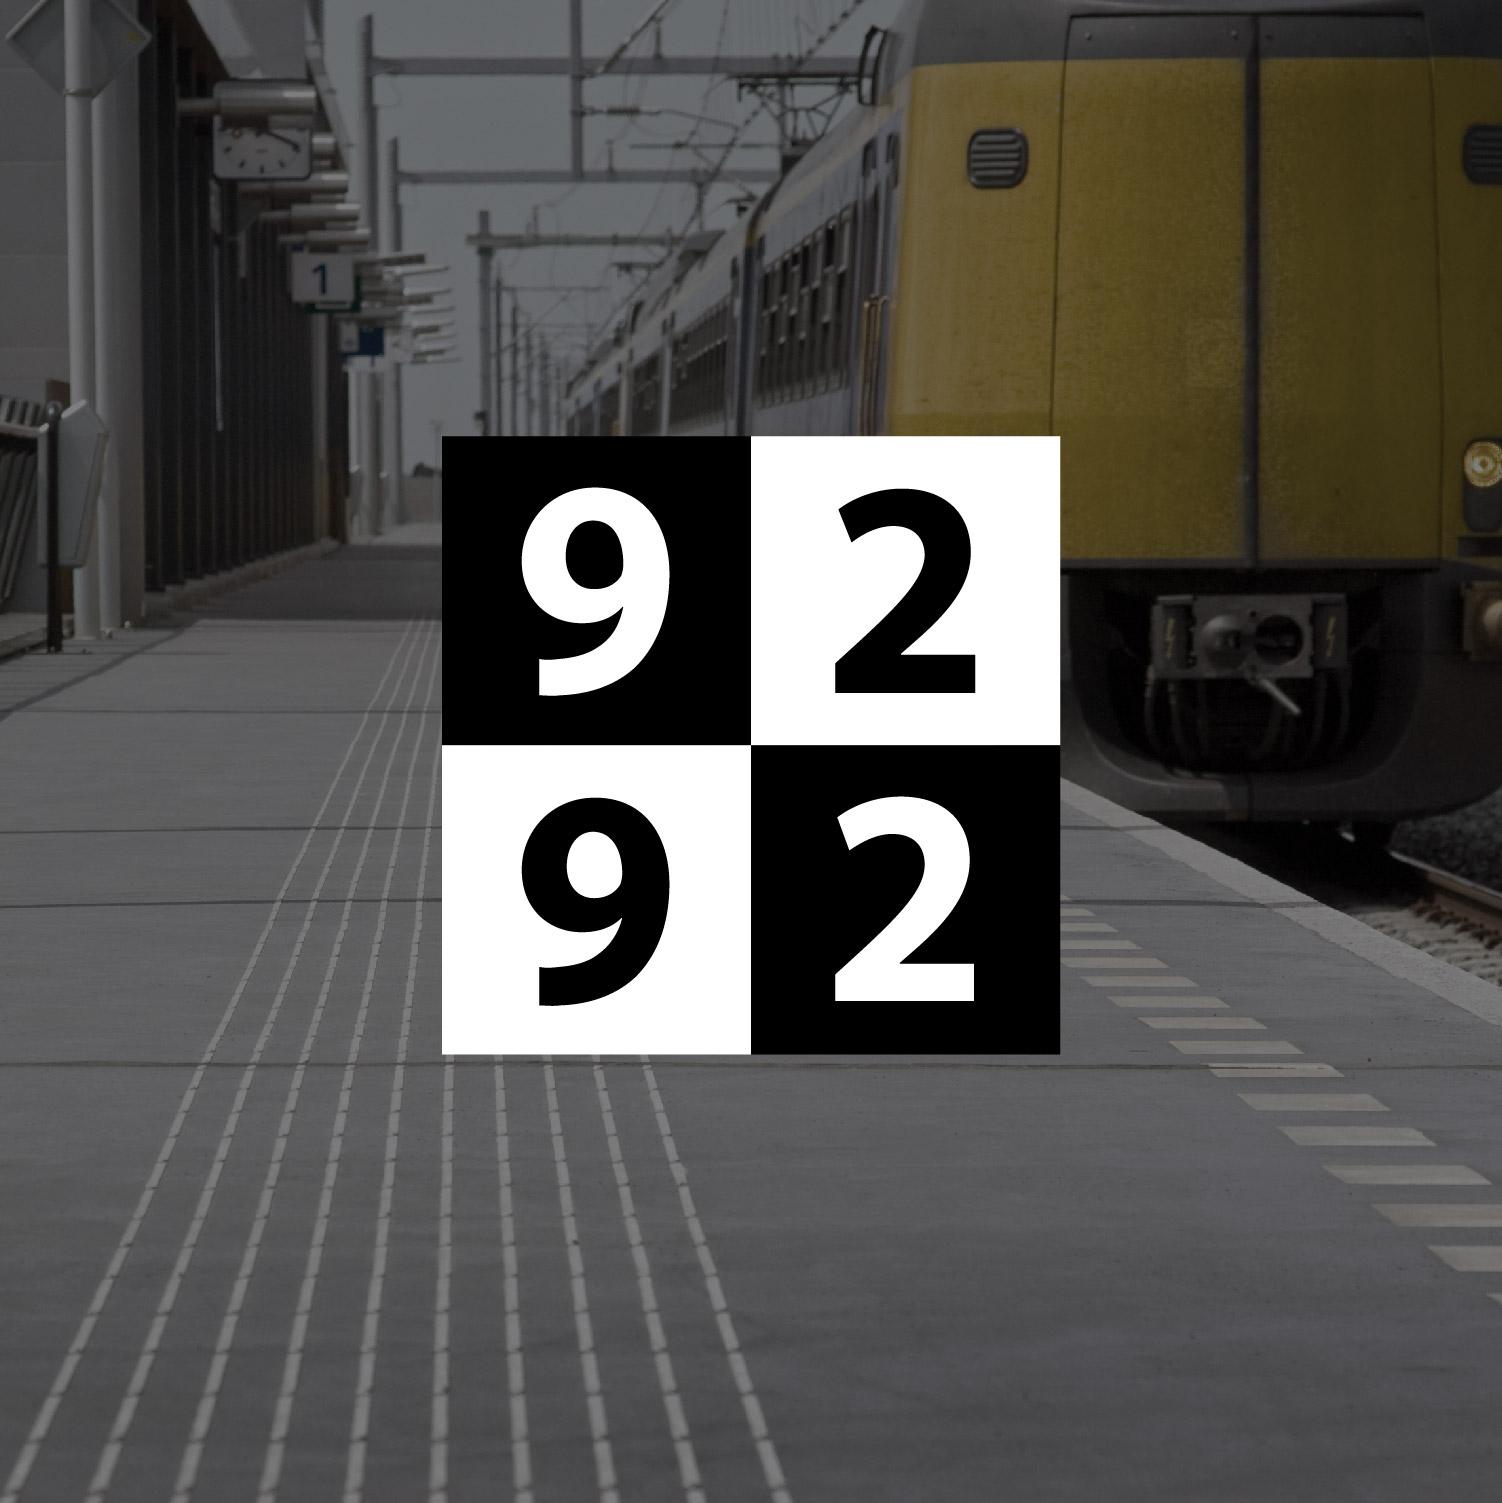 Escalator Issue | Public transport solution